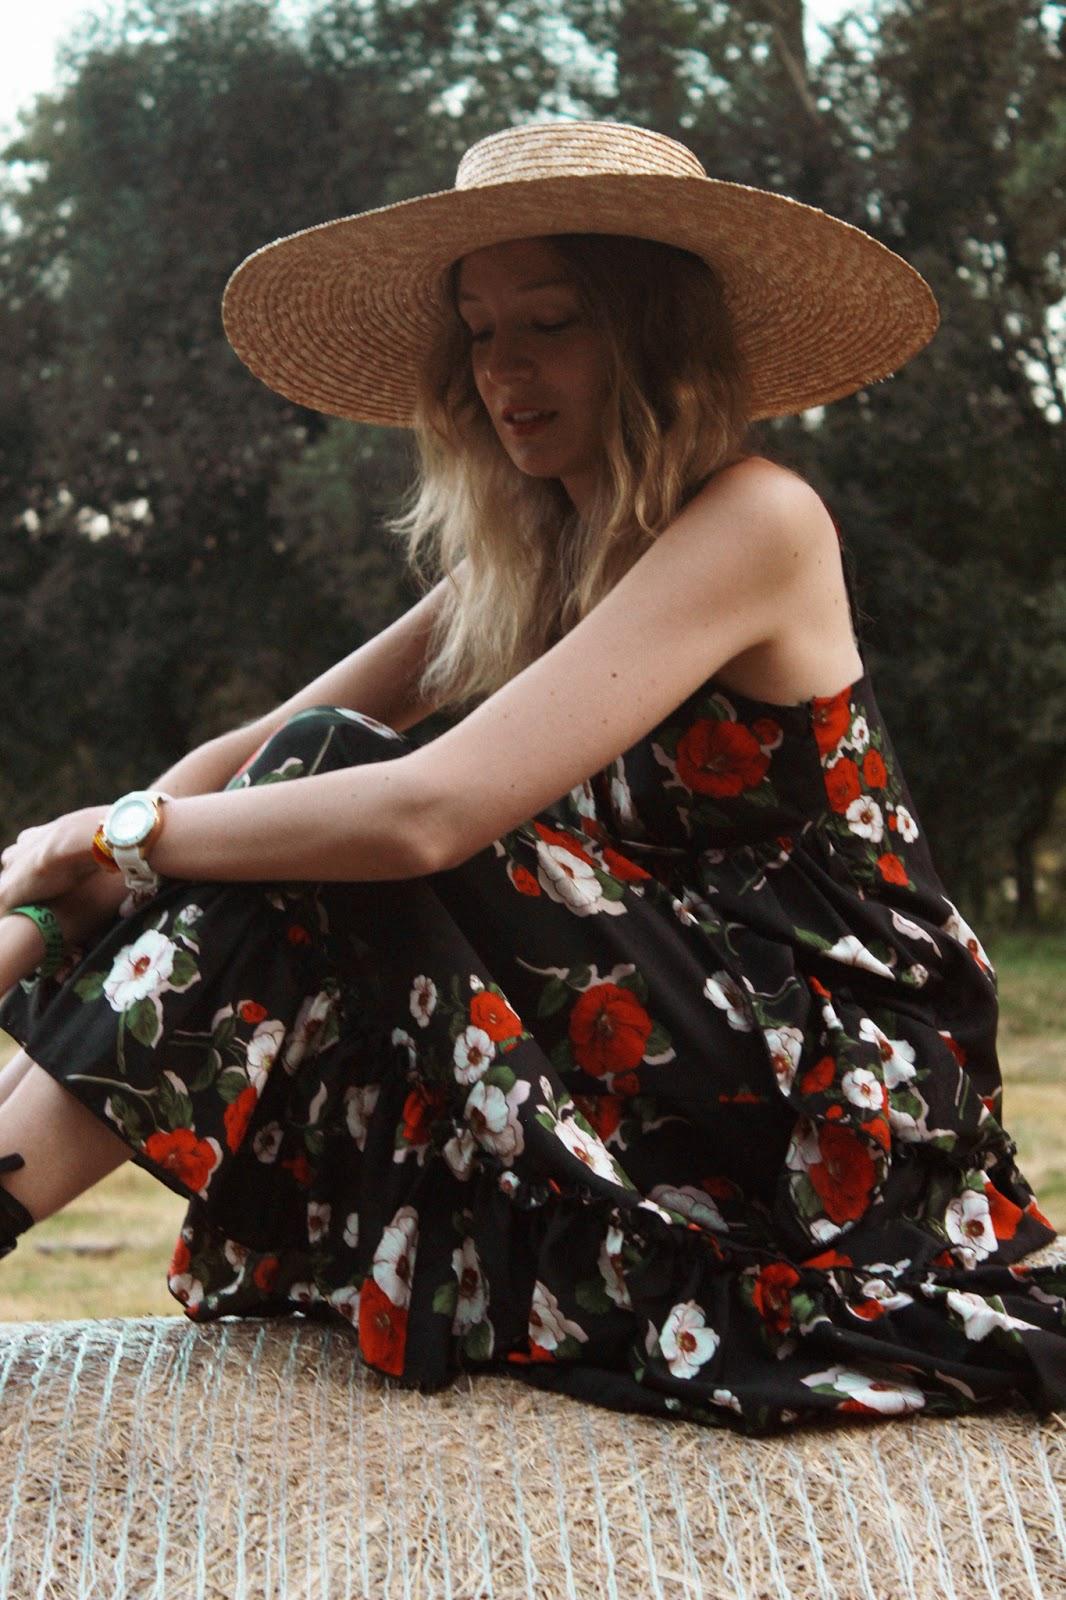 floral-maxi-dress-street-style-straw-hat-lookiero